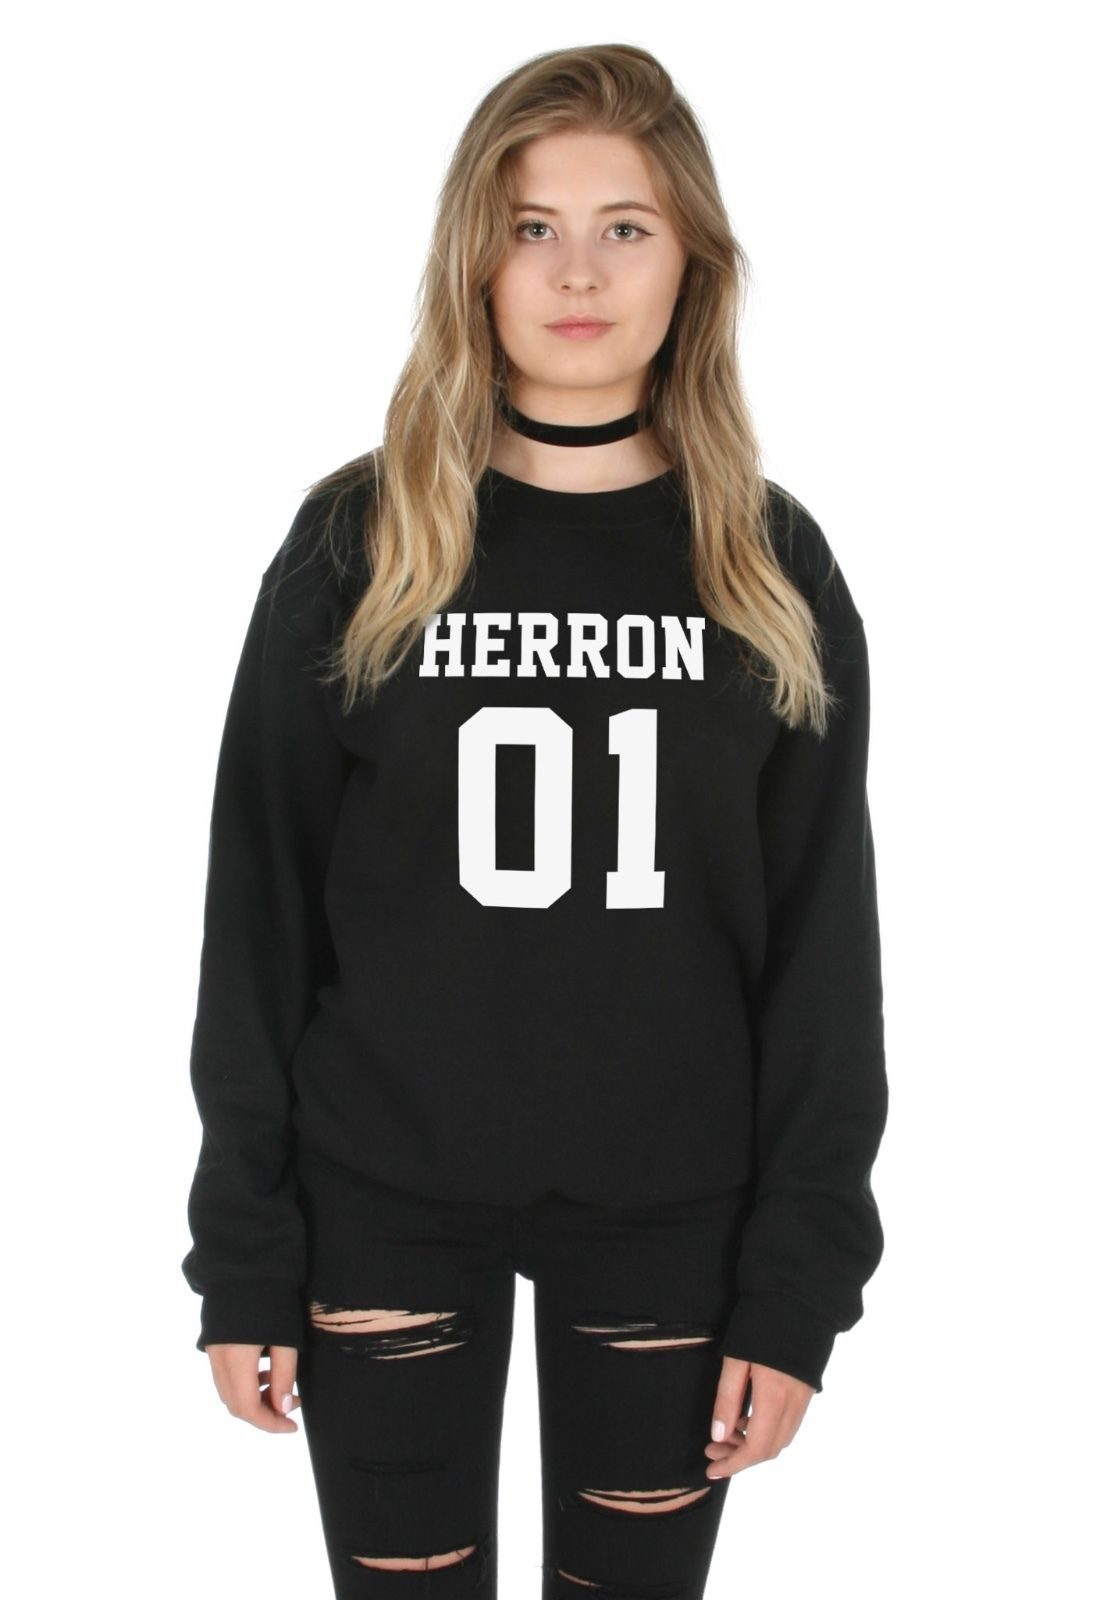 df0059d835698d Herron 01 Jumper Sweater Top Boyband Why Don t We Zach Besson in ...